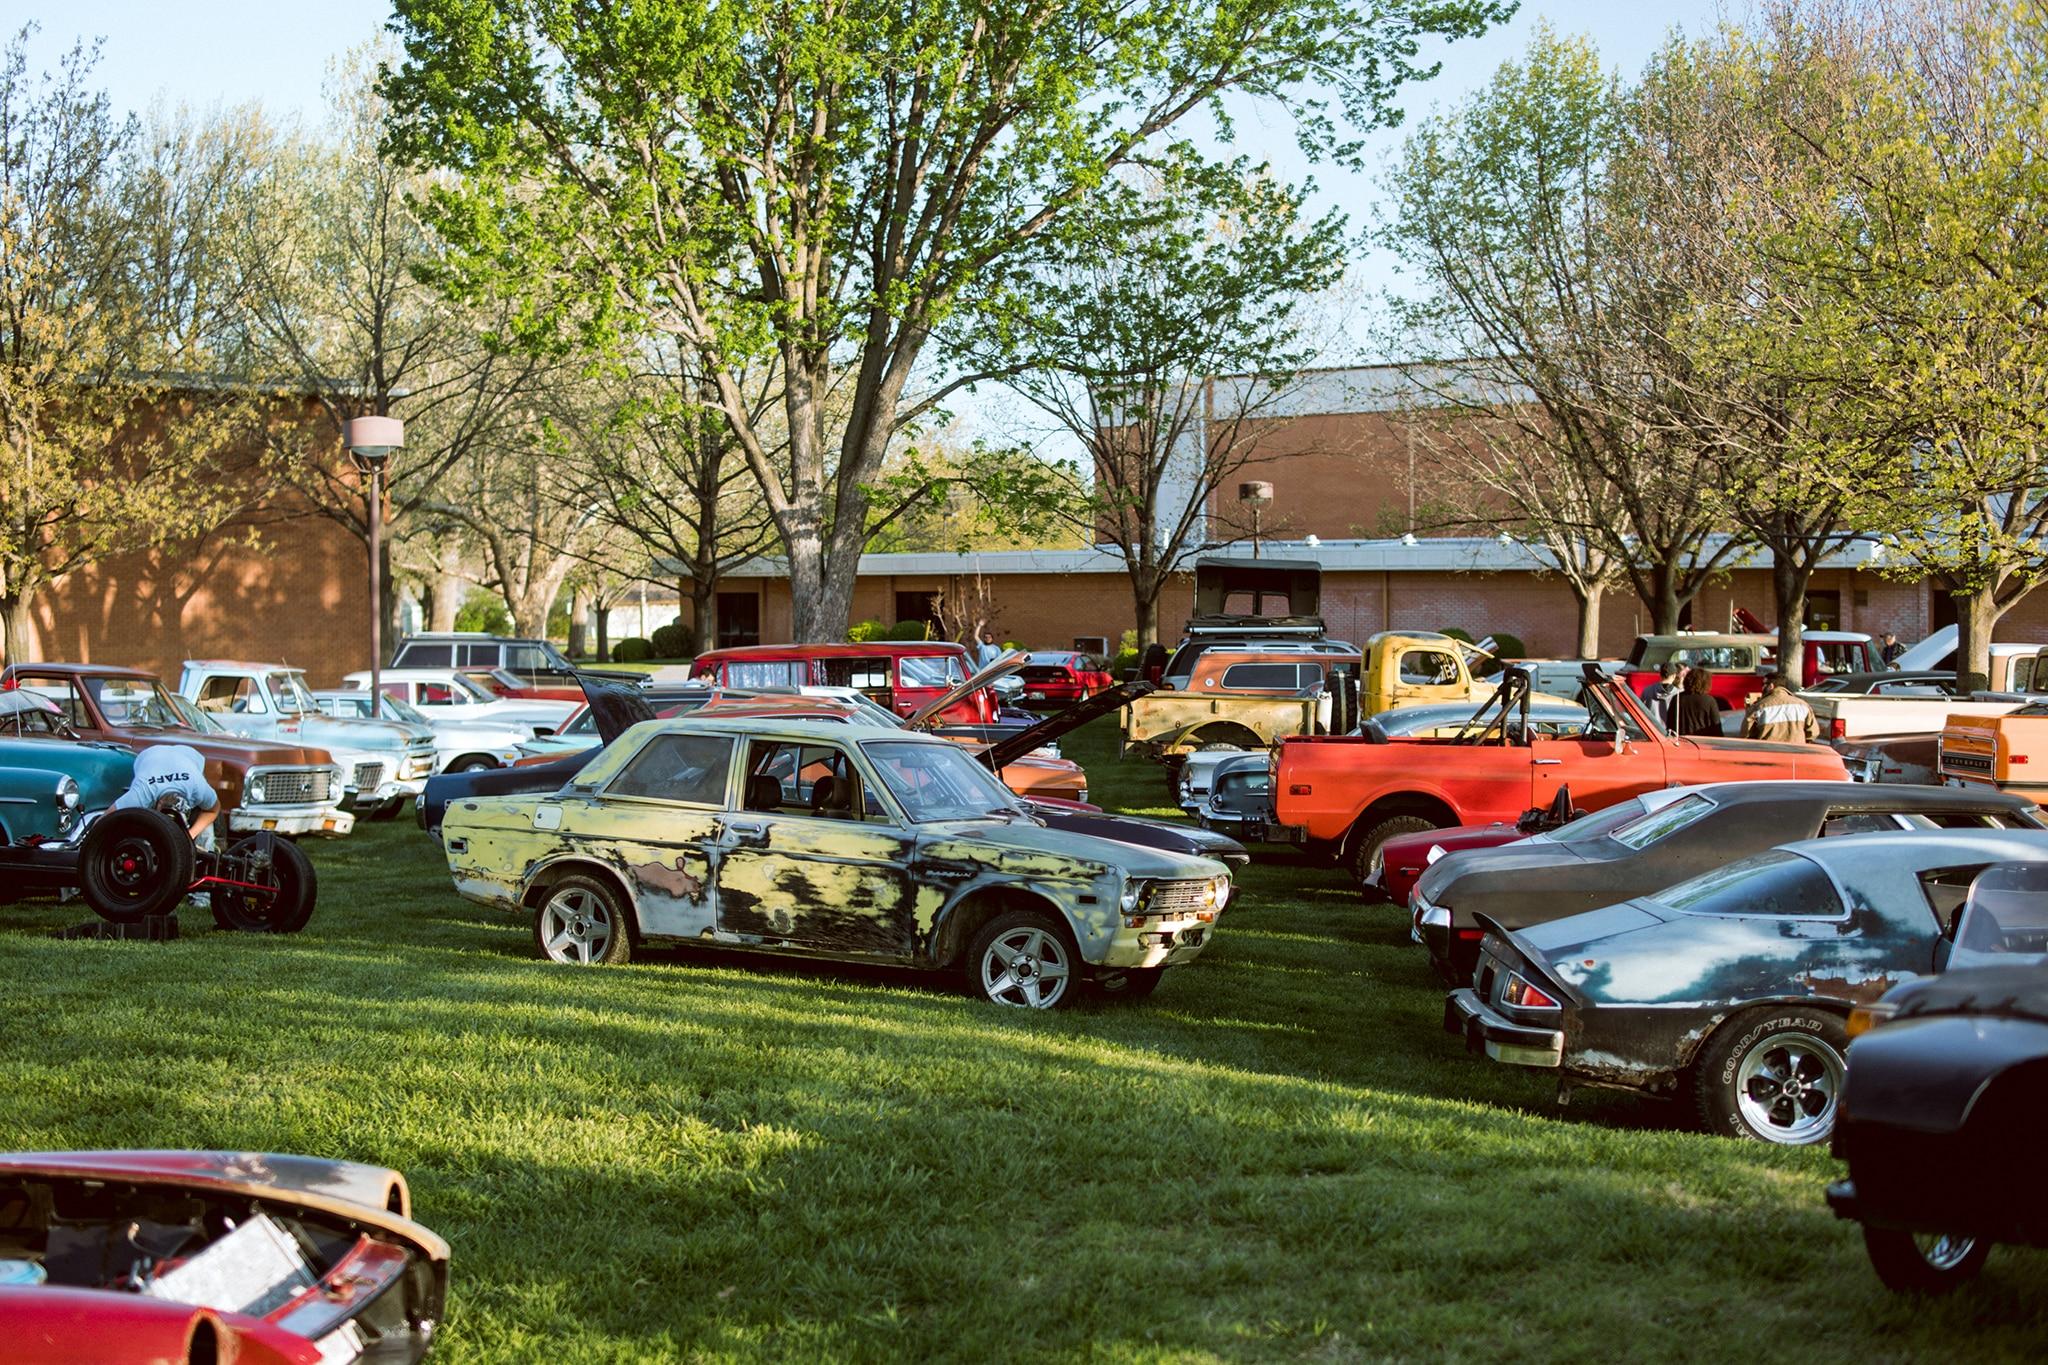 2018 McPherson College CARS Club Motoring Festival 02